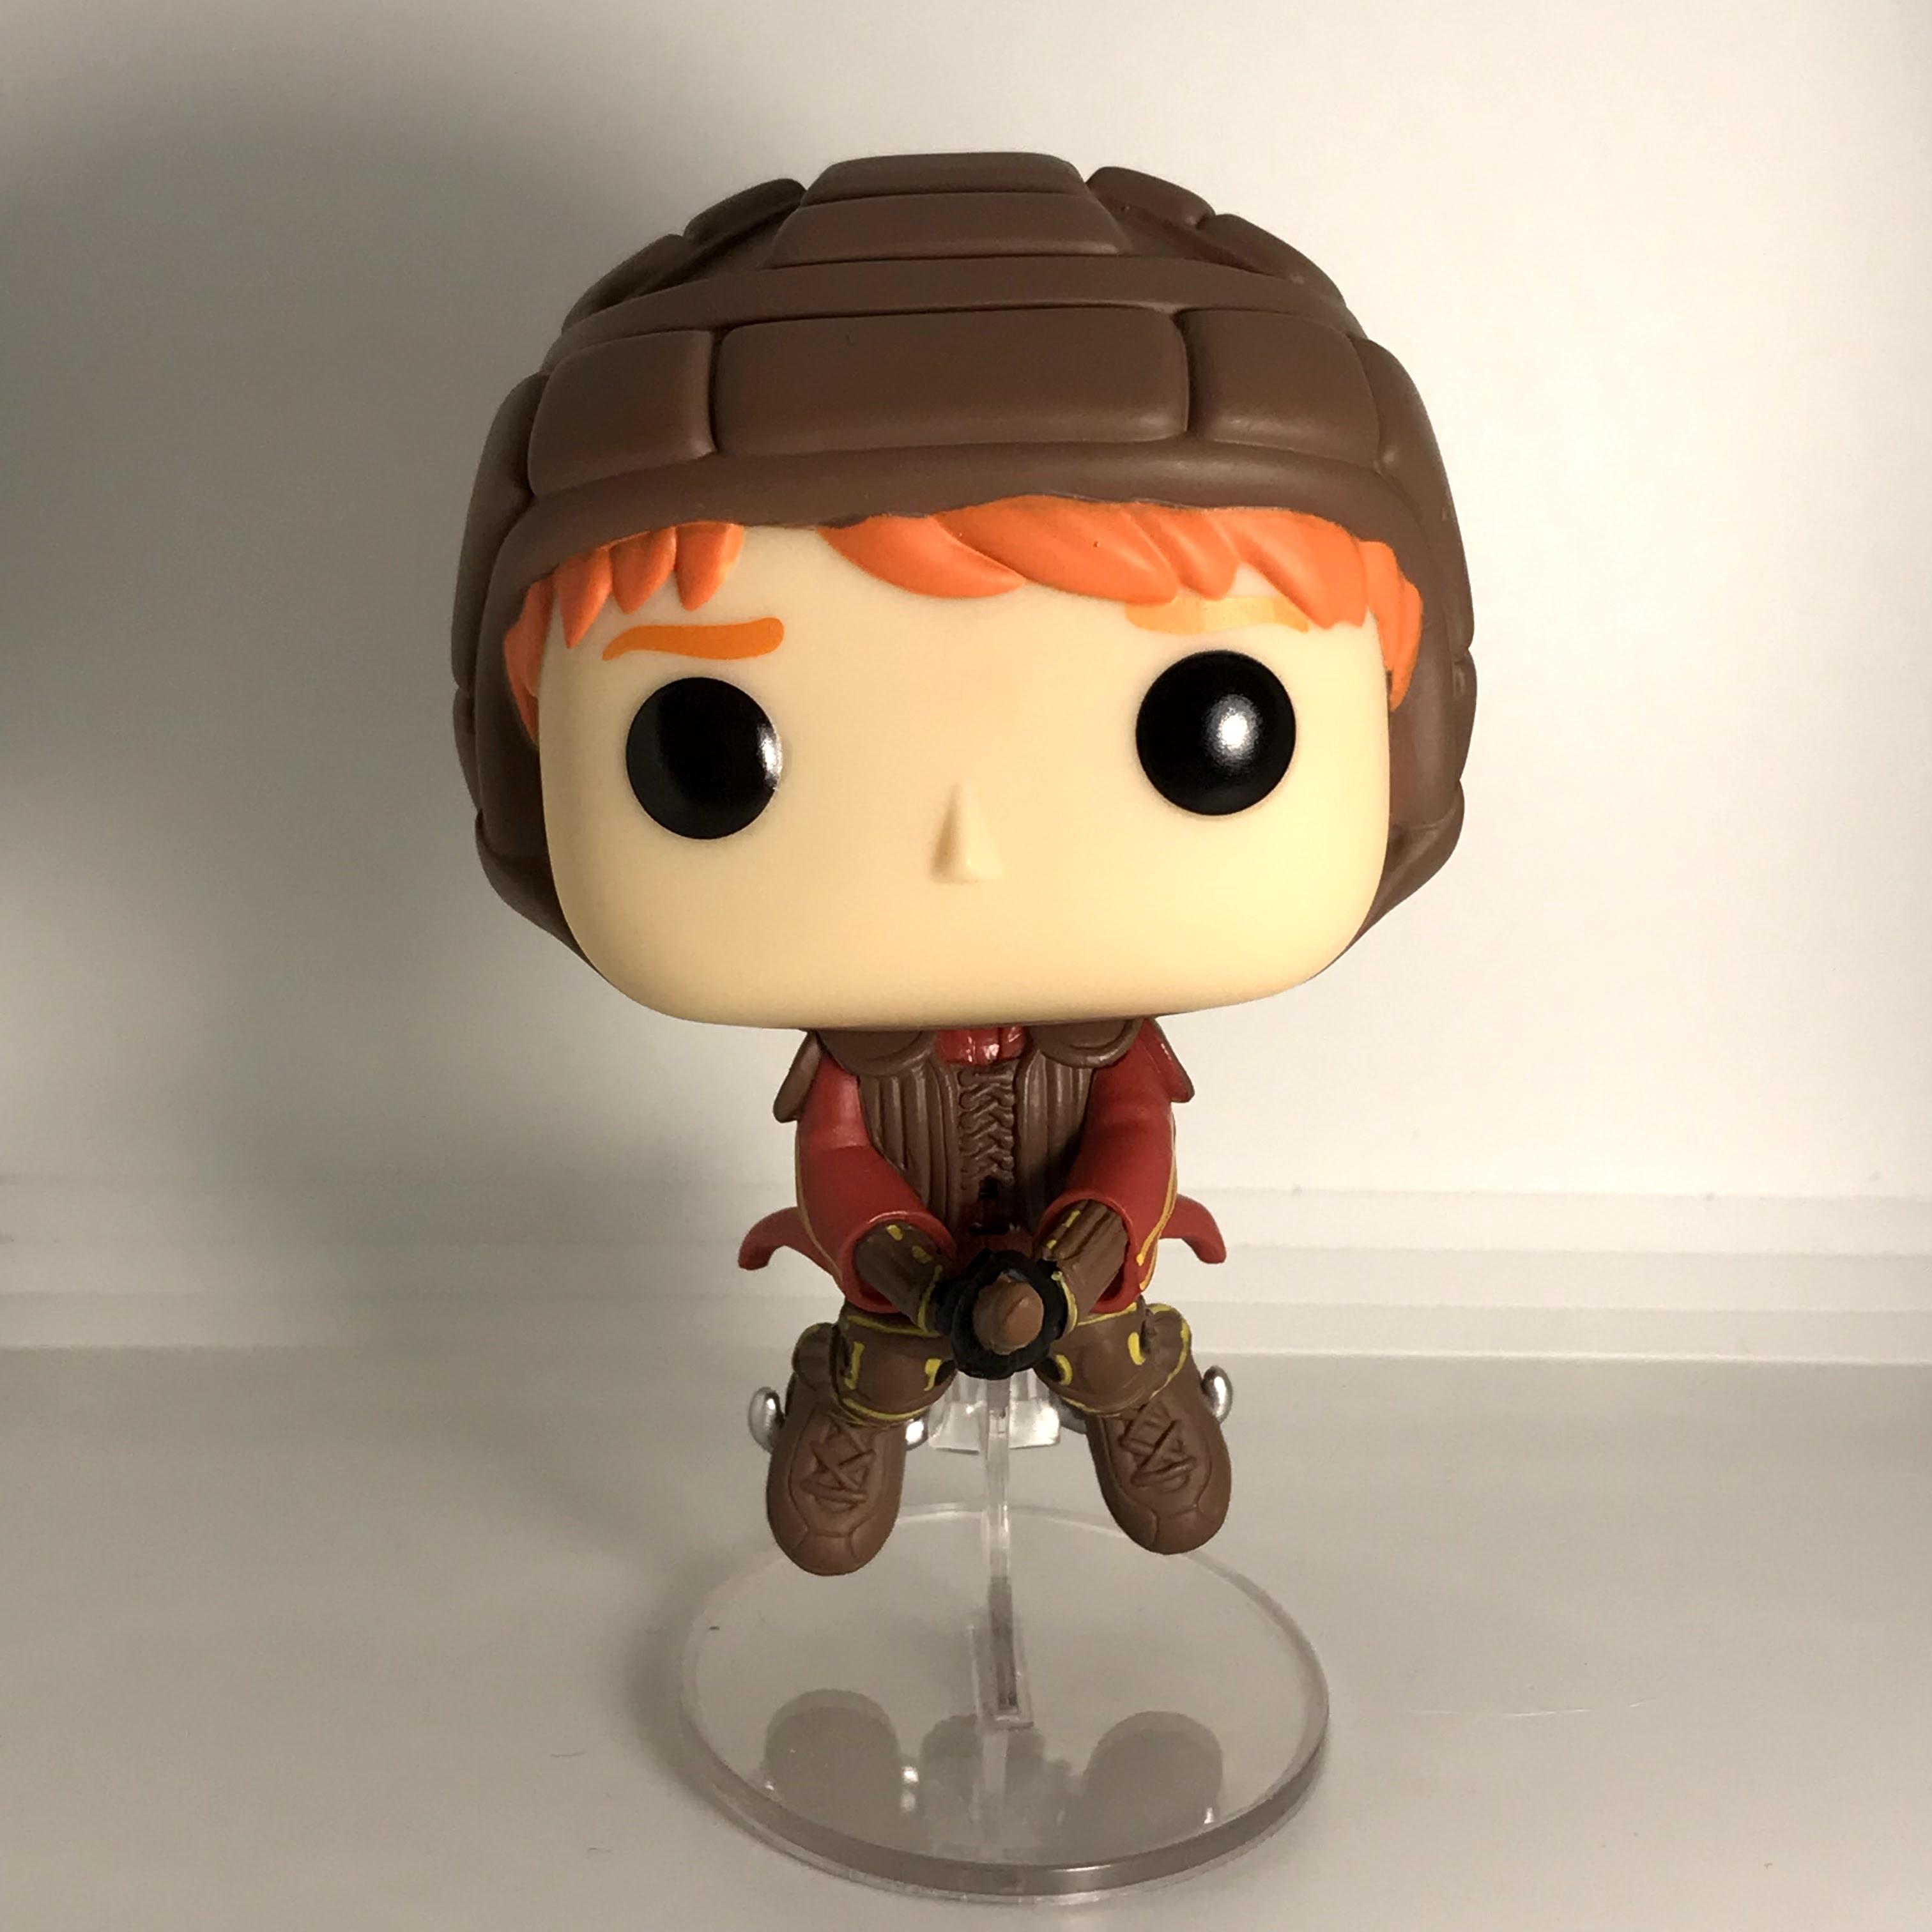 54 Ron Weasley Quidditch Broom